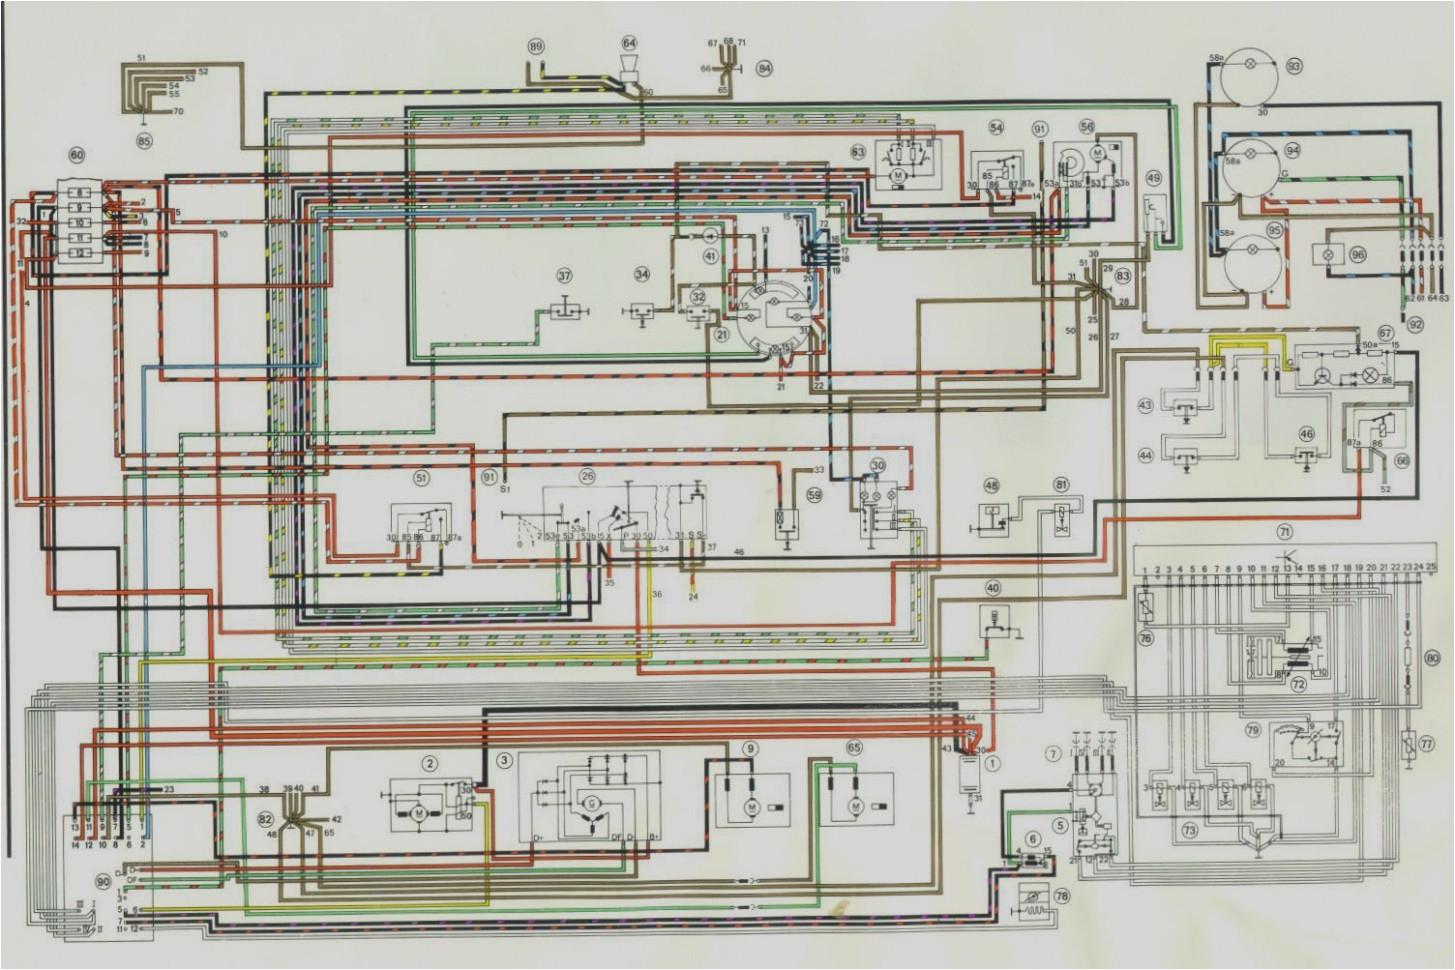 Porsche Wiring Diagrams Porsche 911 Wiring Diagram Download Wiring Diagram Centre